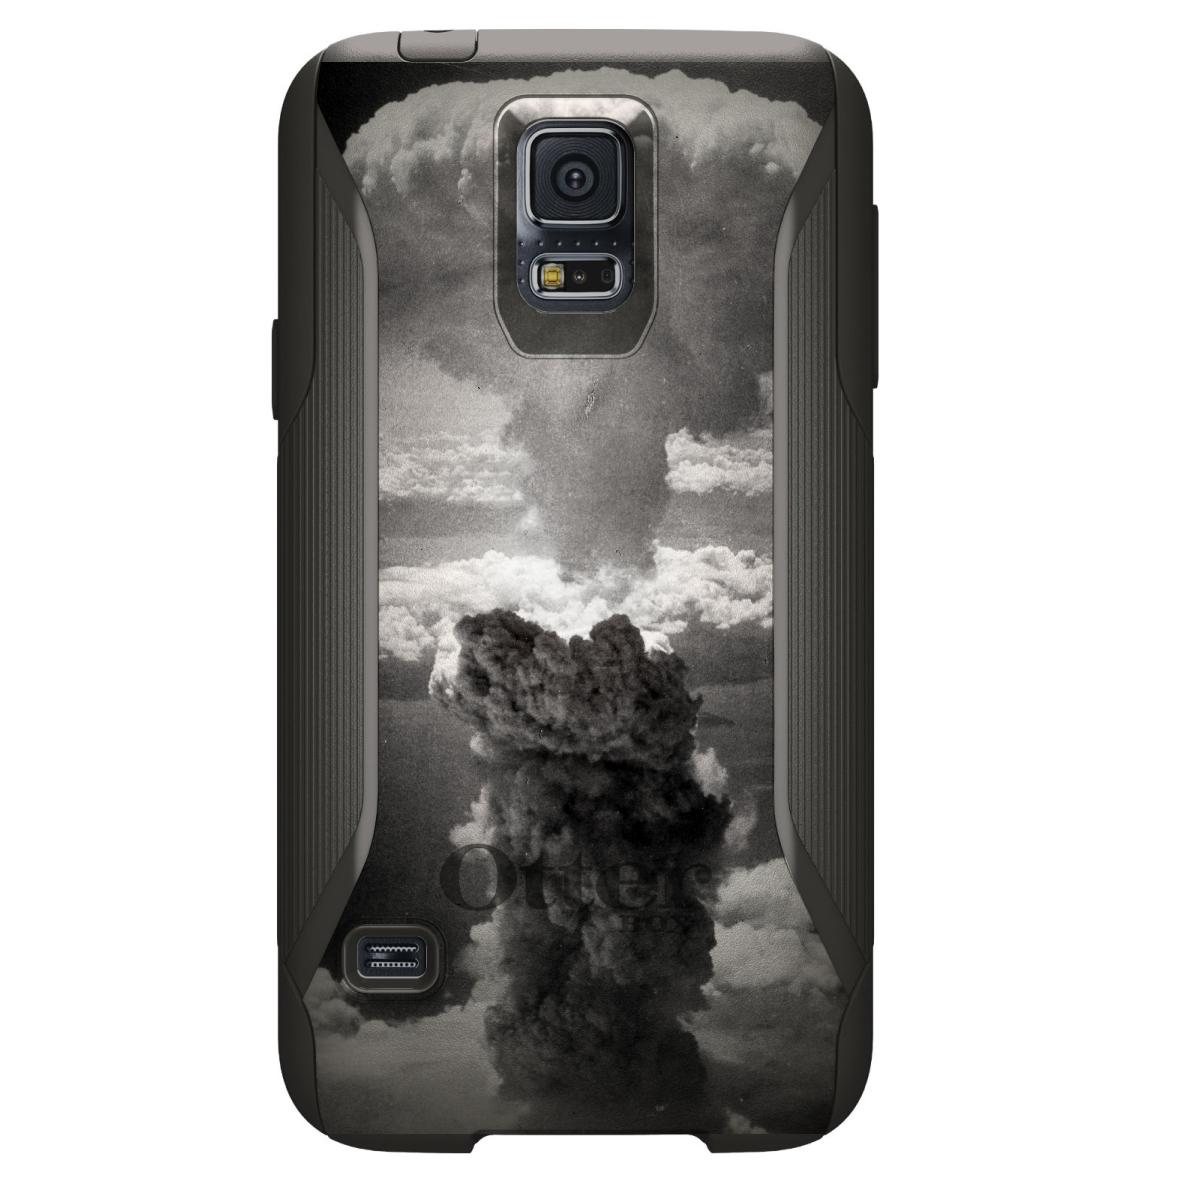 DistinctInk™ Custom Black OtterBox Commuter Series Case for Samsung Galaxy S5 - Nuclear Mushroom Cloud